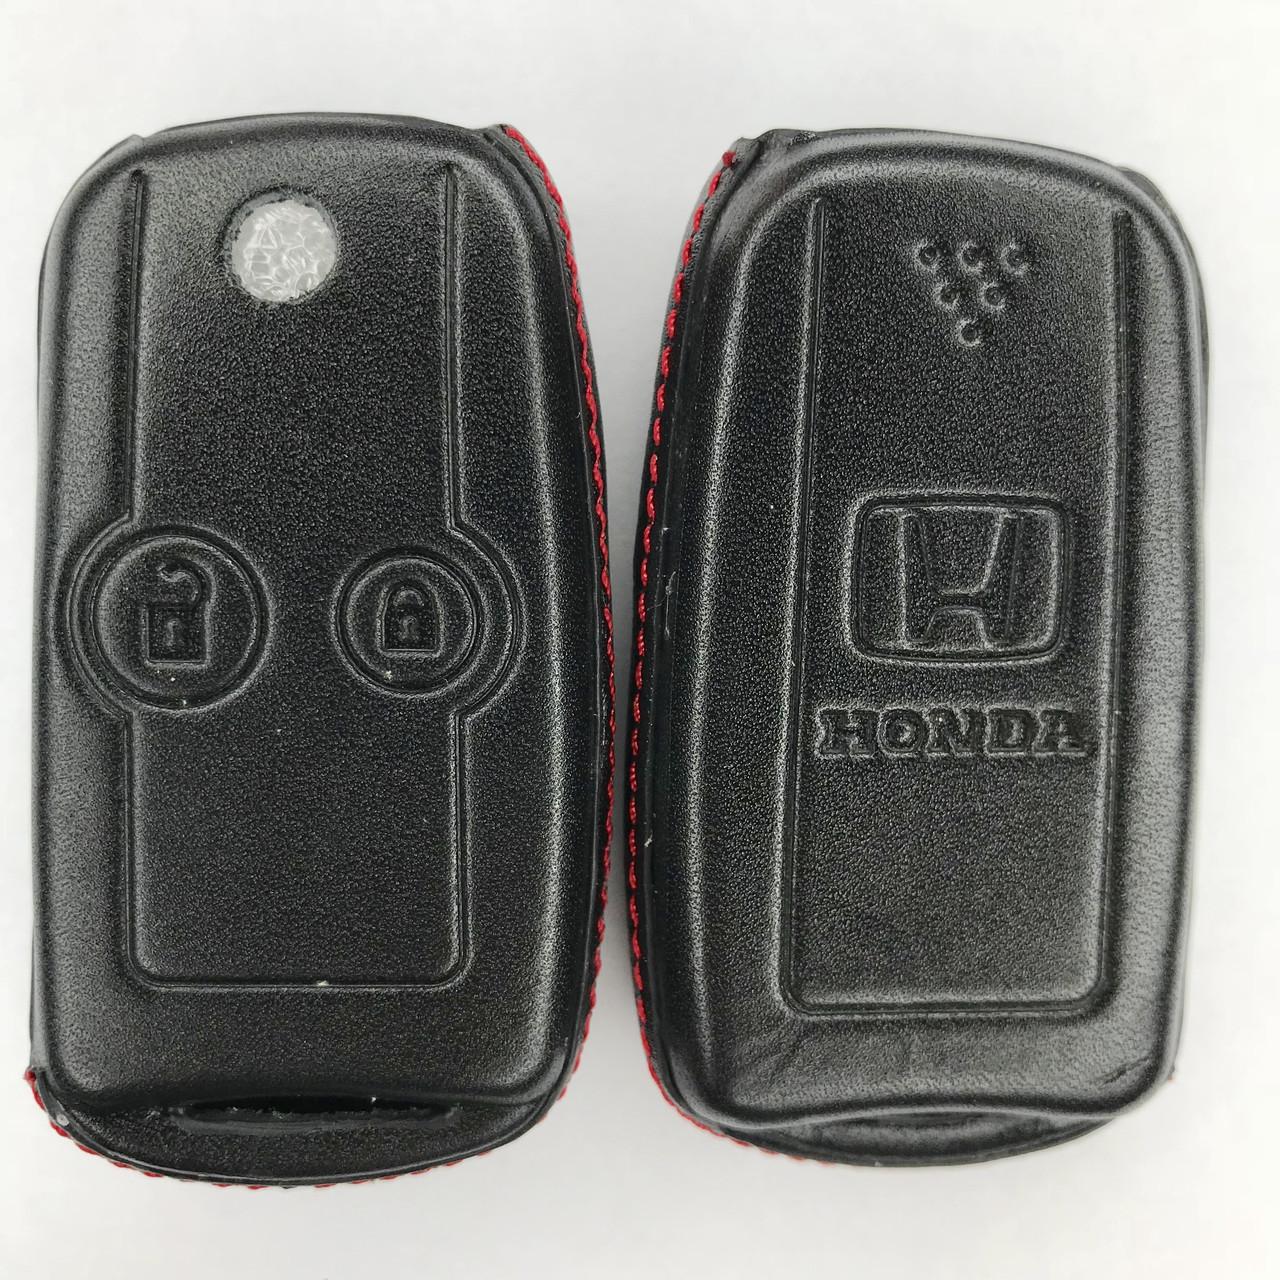 Кожаный чехол для ключа Honda Accord,Civic,Civic Type R,Crosstour, CR-V,Fit,FR-V,HR-V,jazz,Pilot